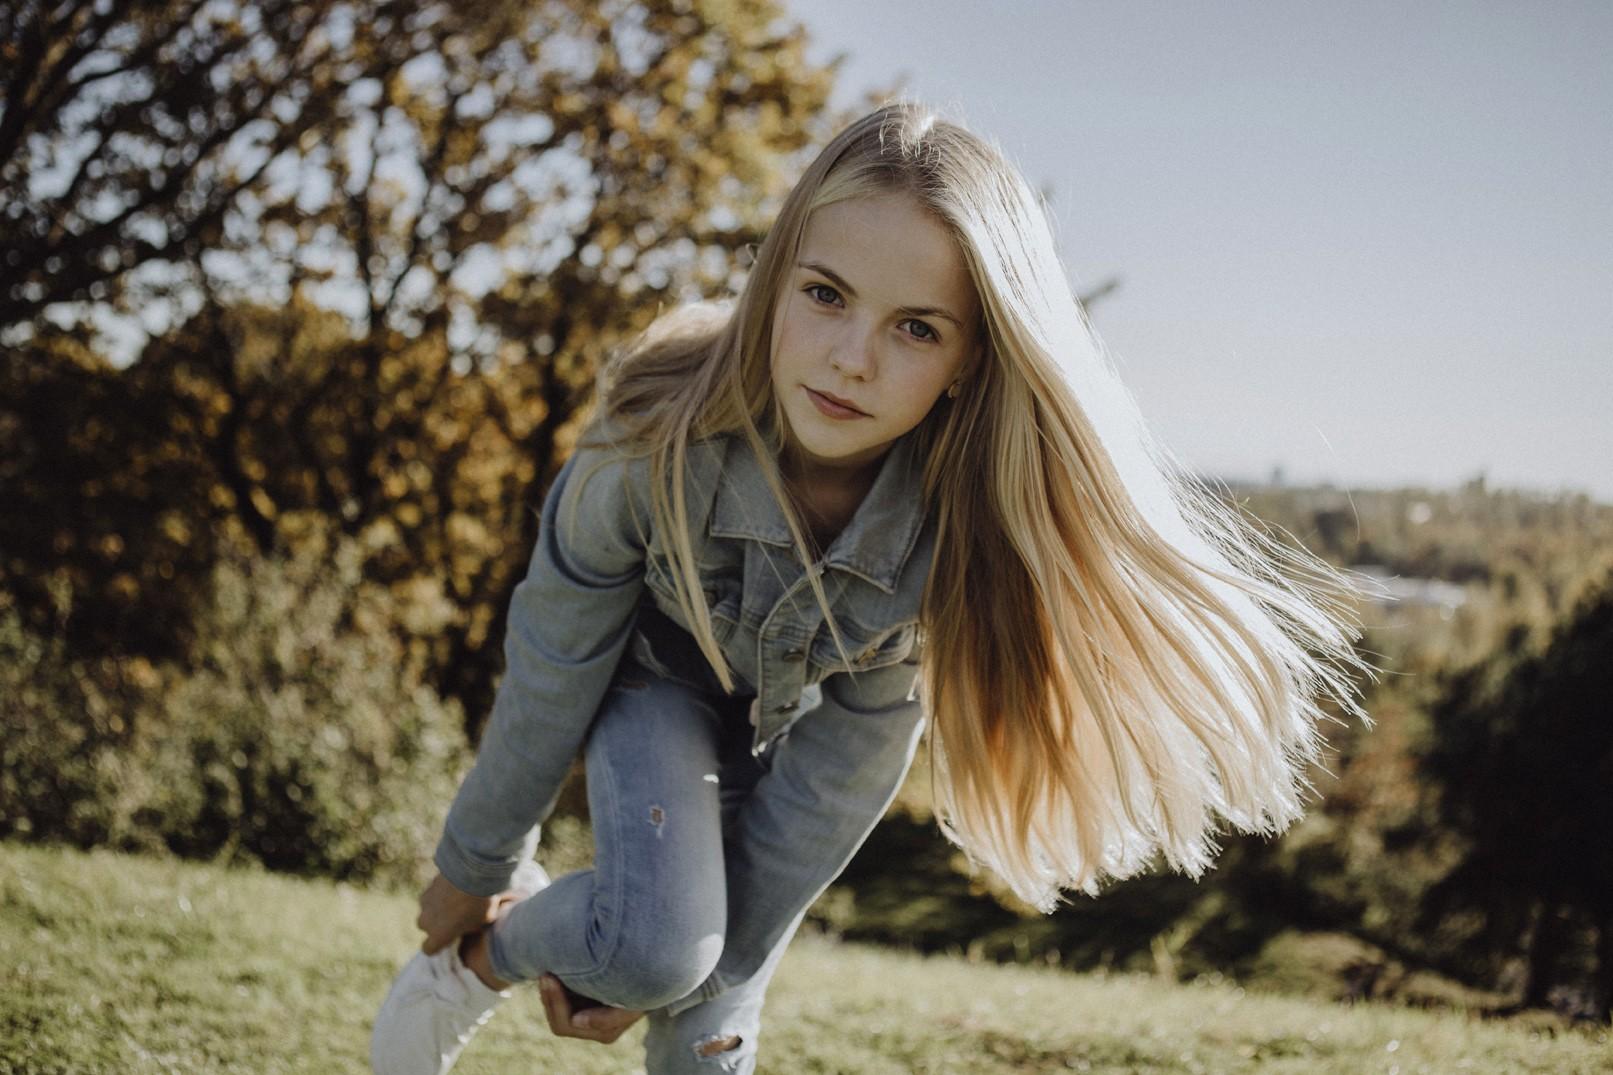 johanna-lohr-fotografie-fotoshooting_11A2951